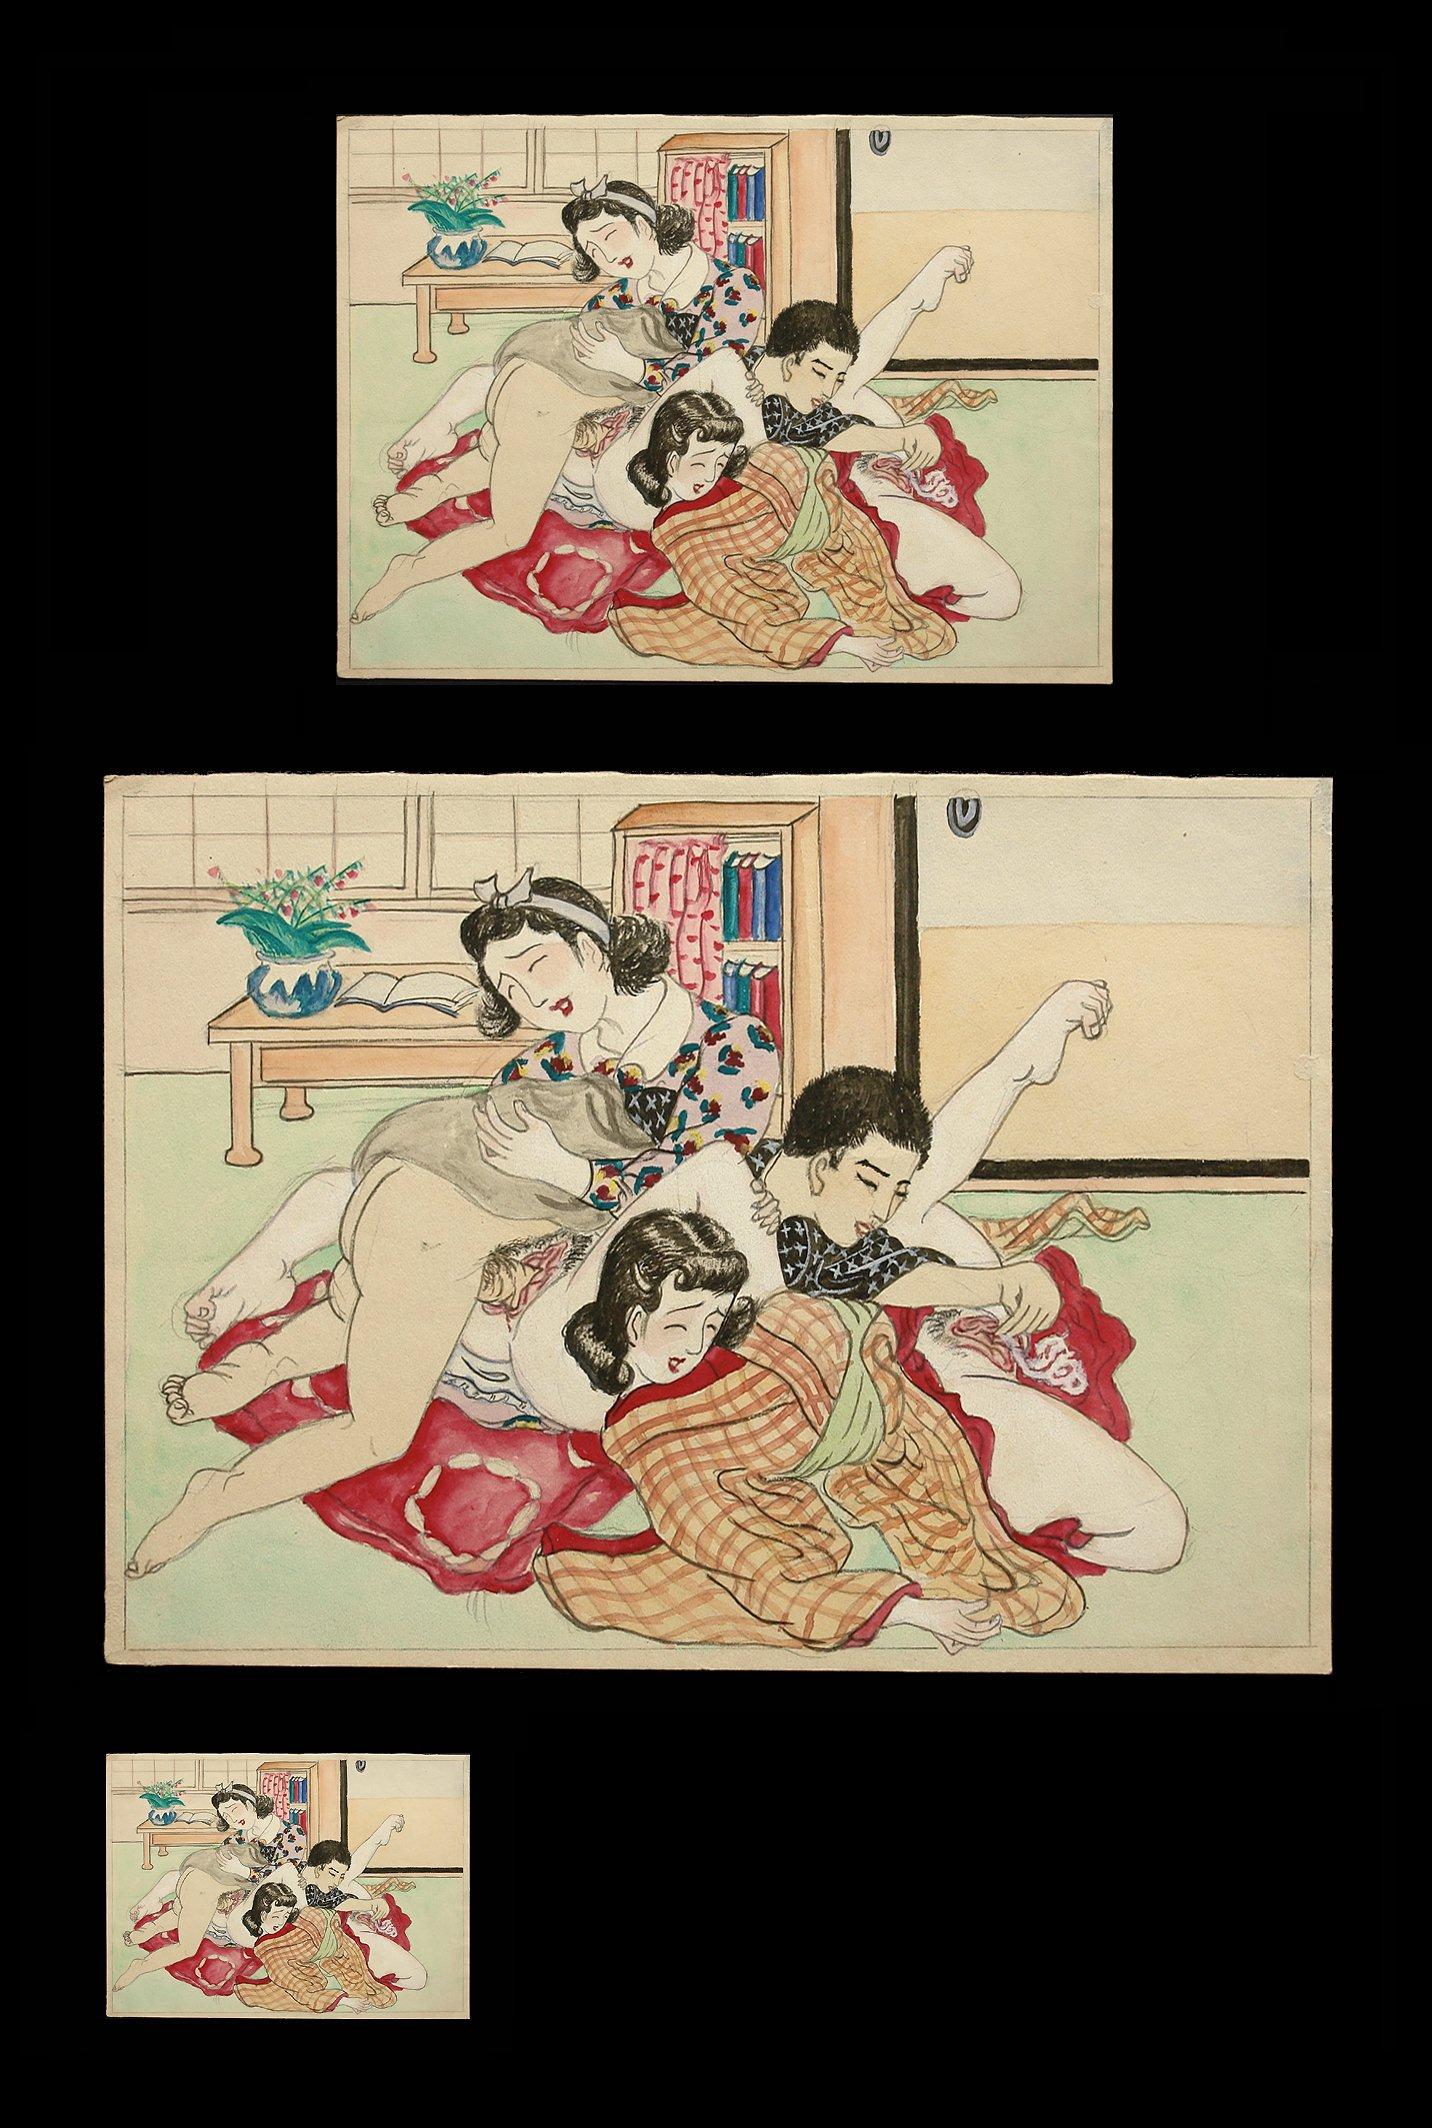 what tsuna kimura creampie final, sorry, but all